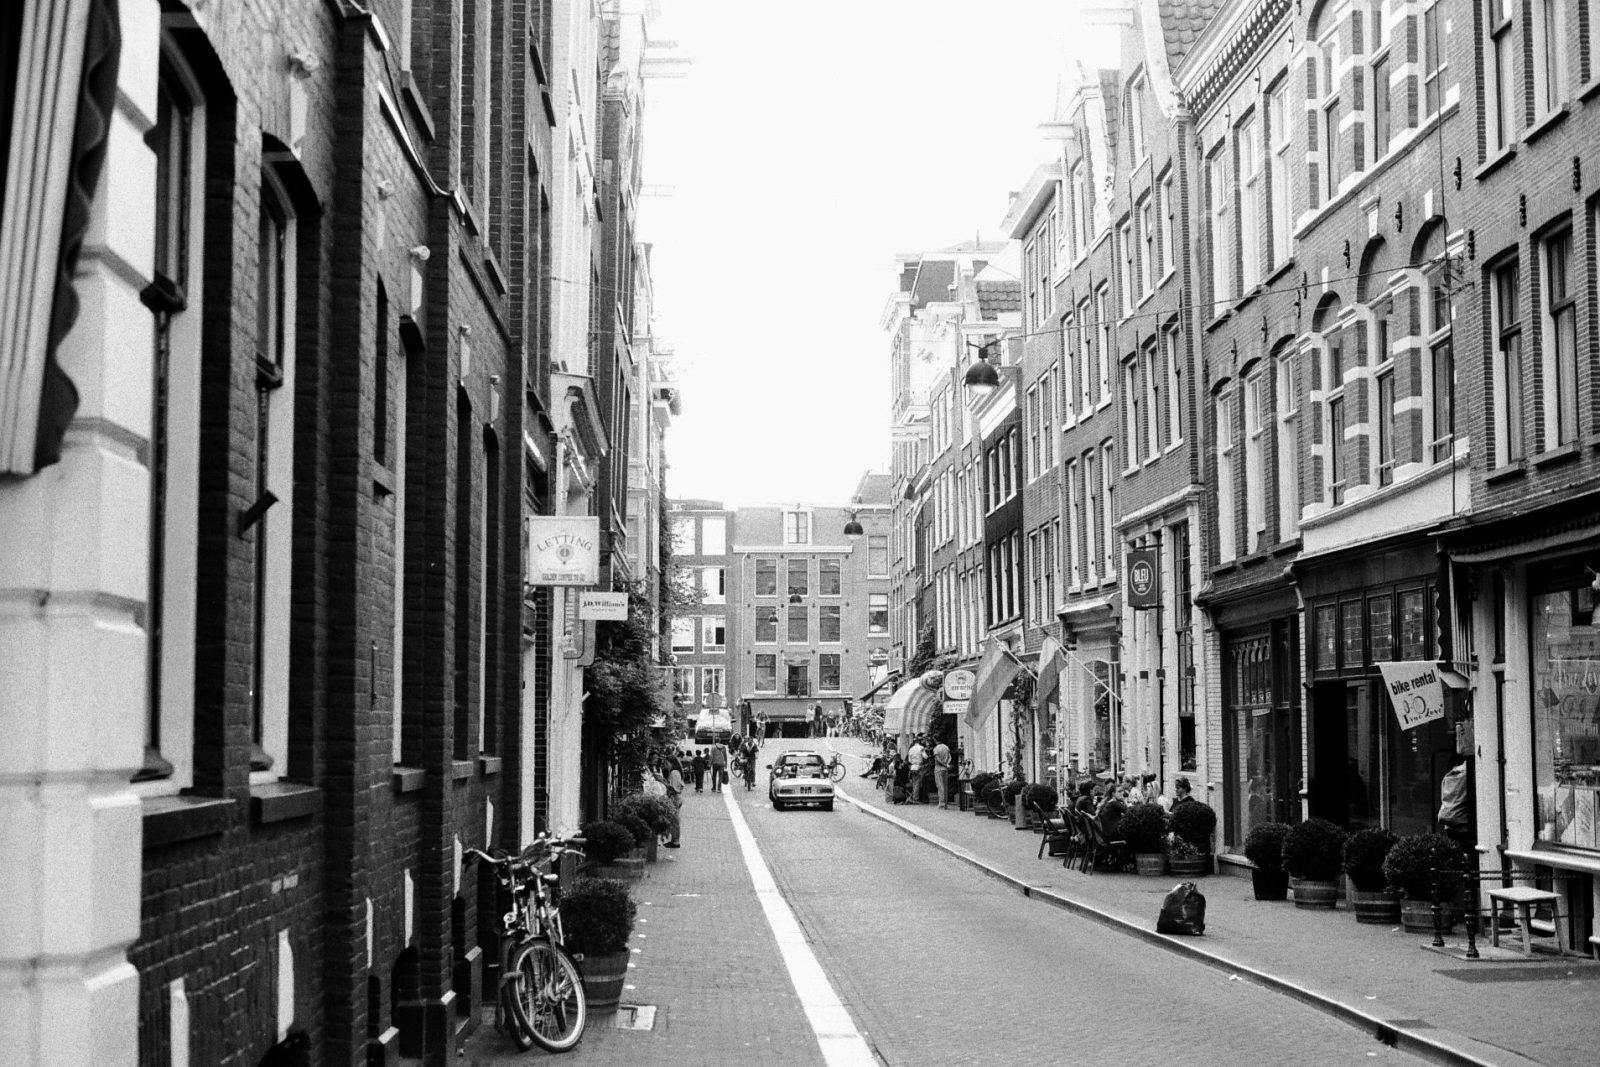 Amterdam street